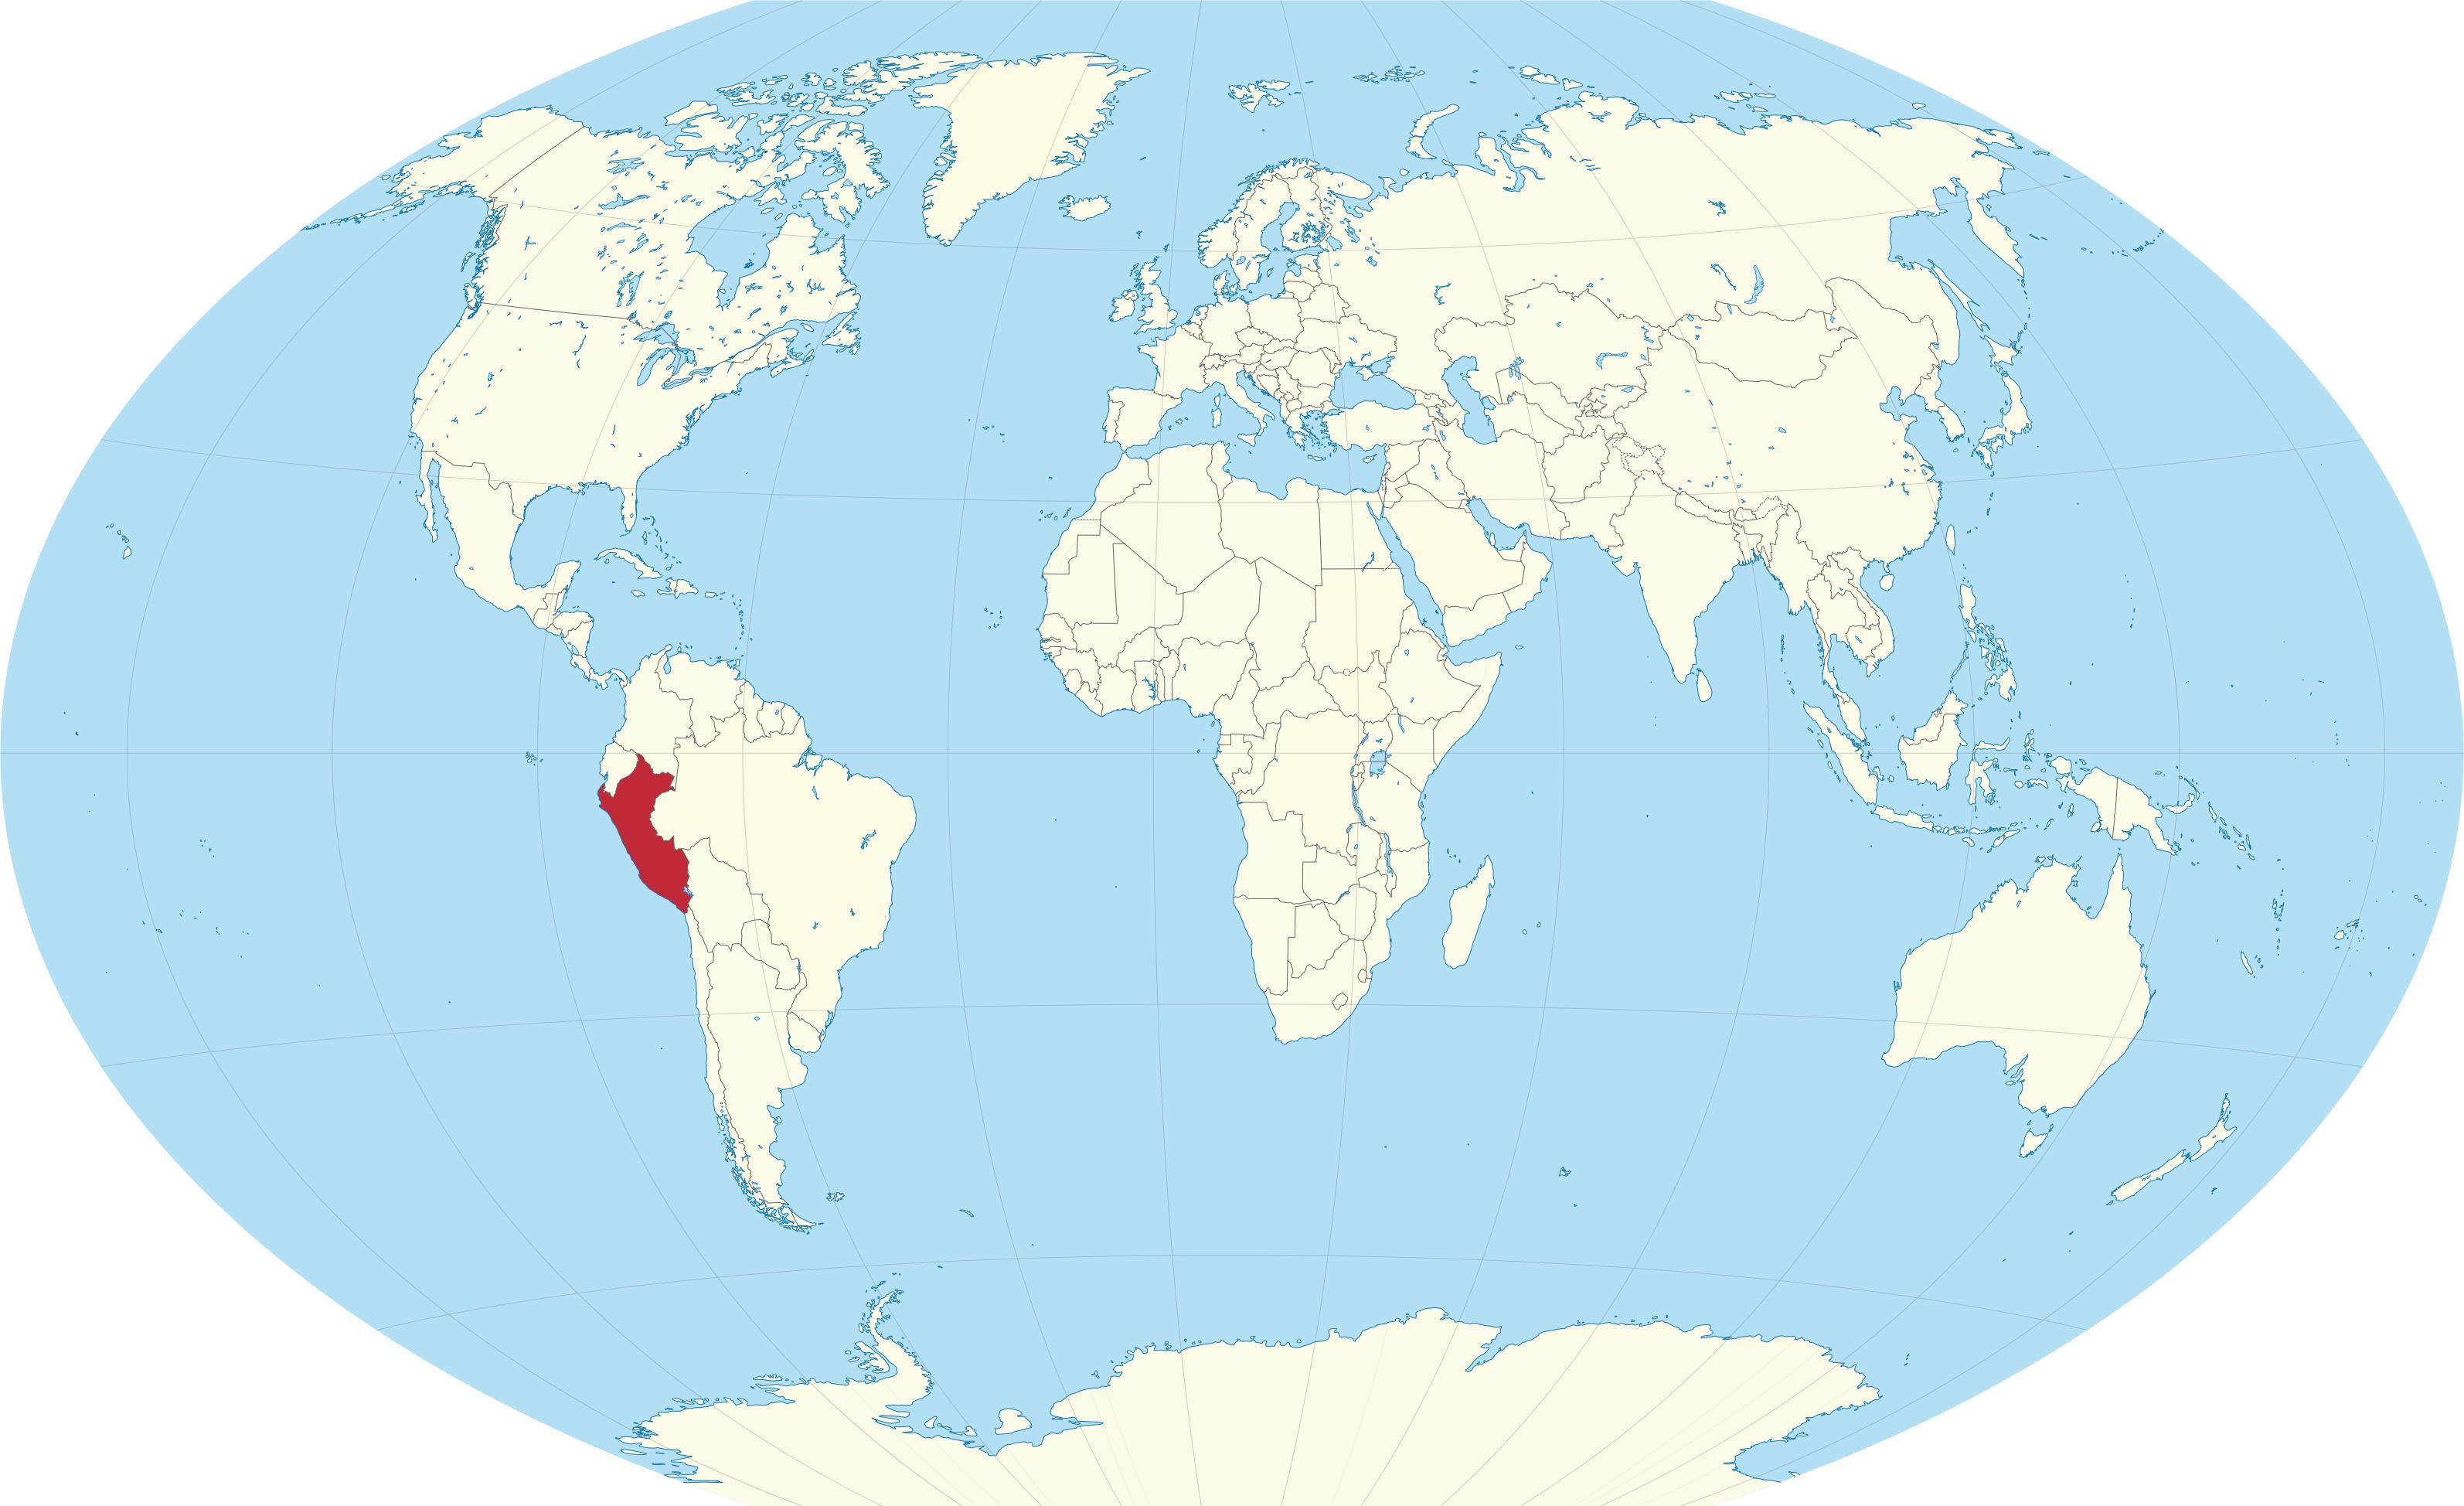 Peru auf der world map - Weltkarte Peru (South America - Südamerika)